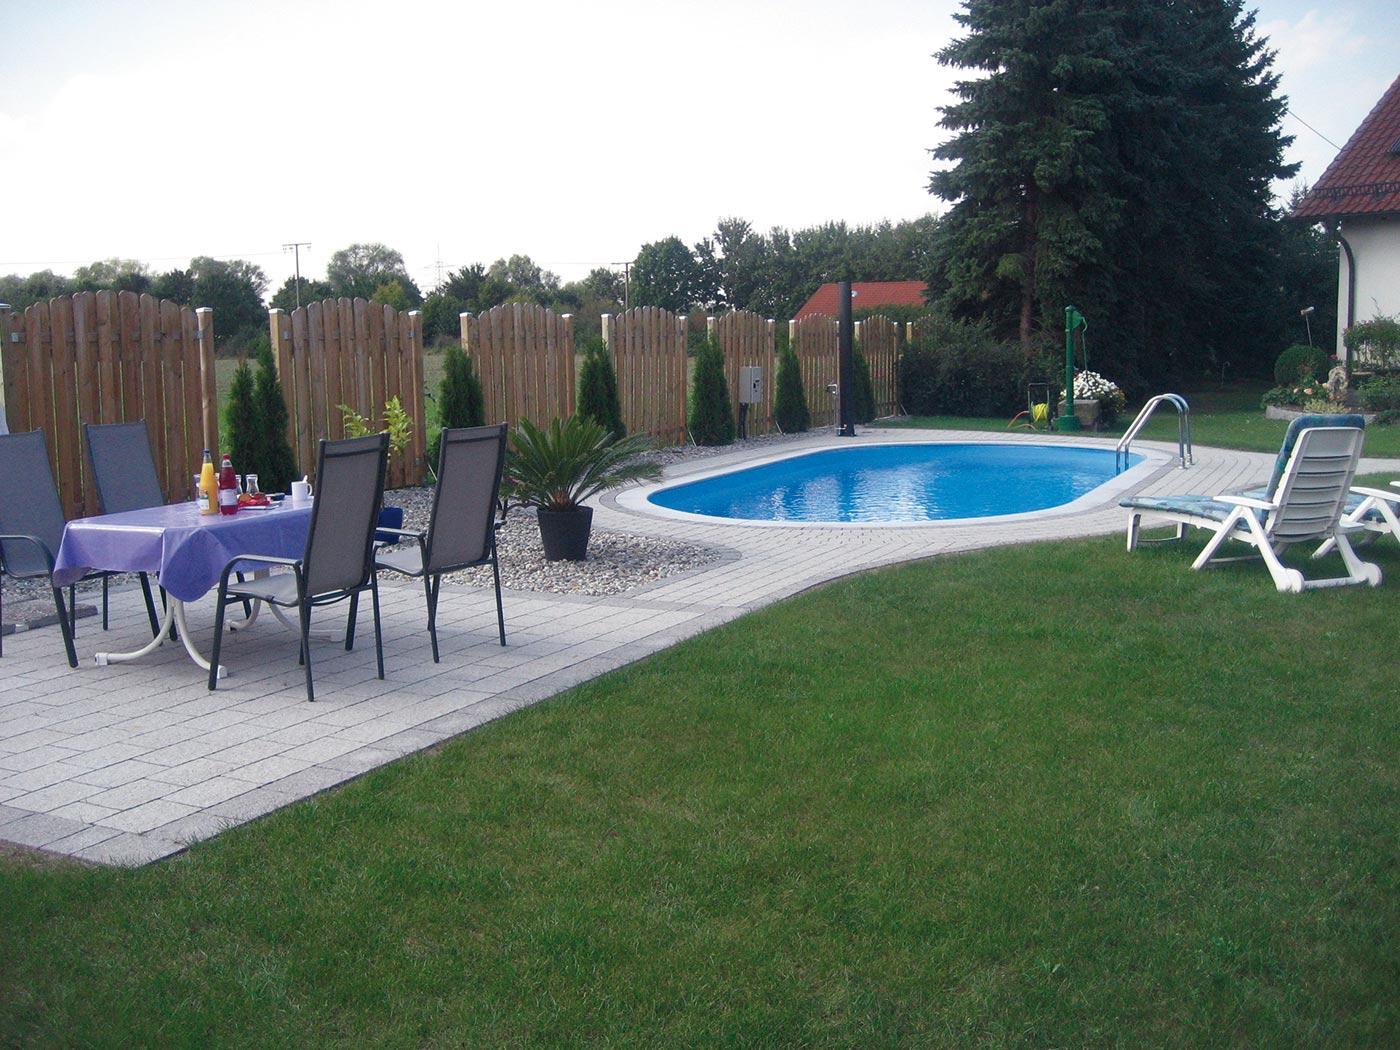 Oval pool selber bauen poolbau youtube swimmingpool for Gartenpool 3m